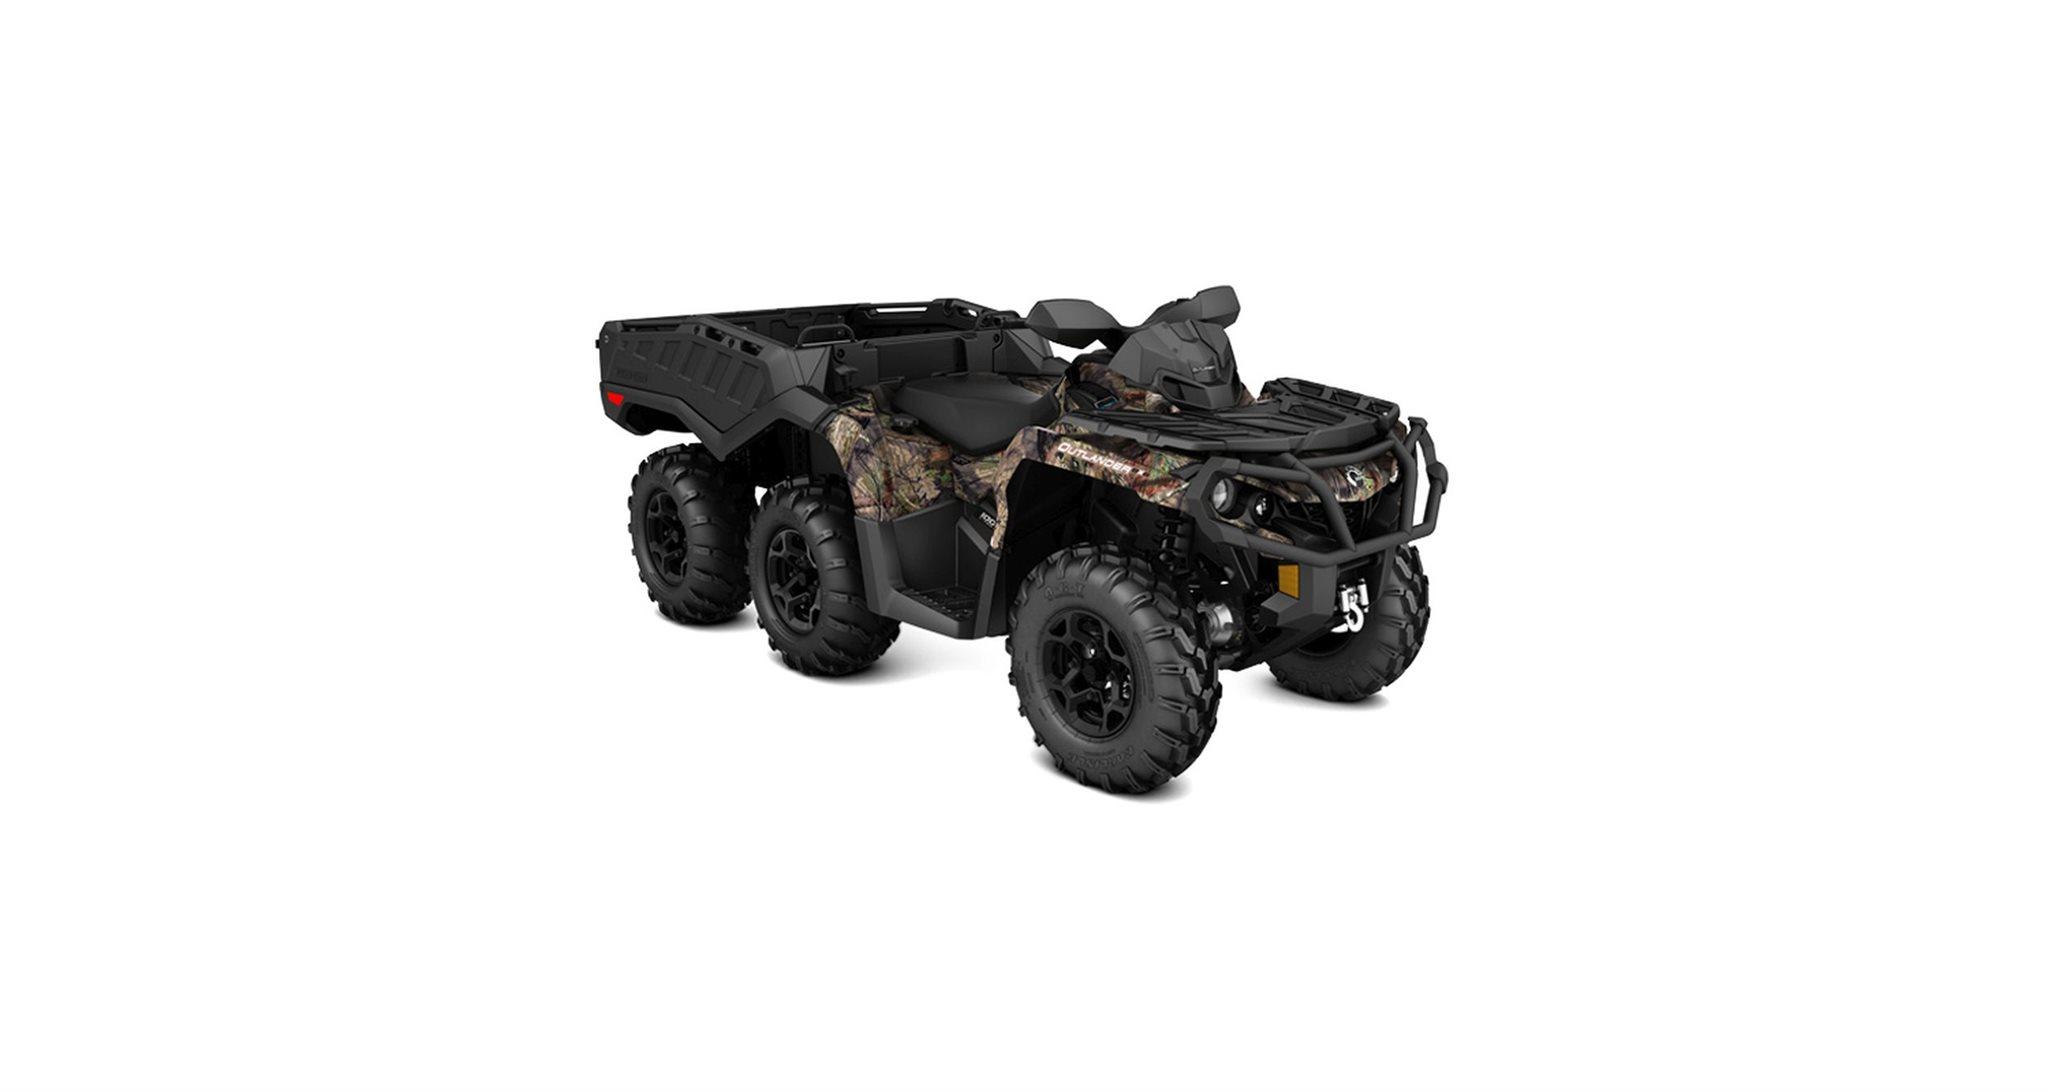 motorrad can am outlander 6x6 1000 xt baujahr 2018 0. Black Bedroom Furniture Sets. Home Design Ideas